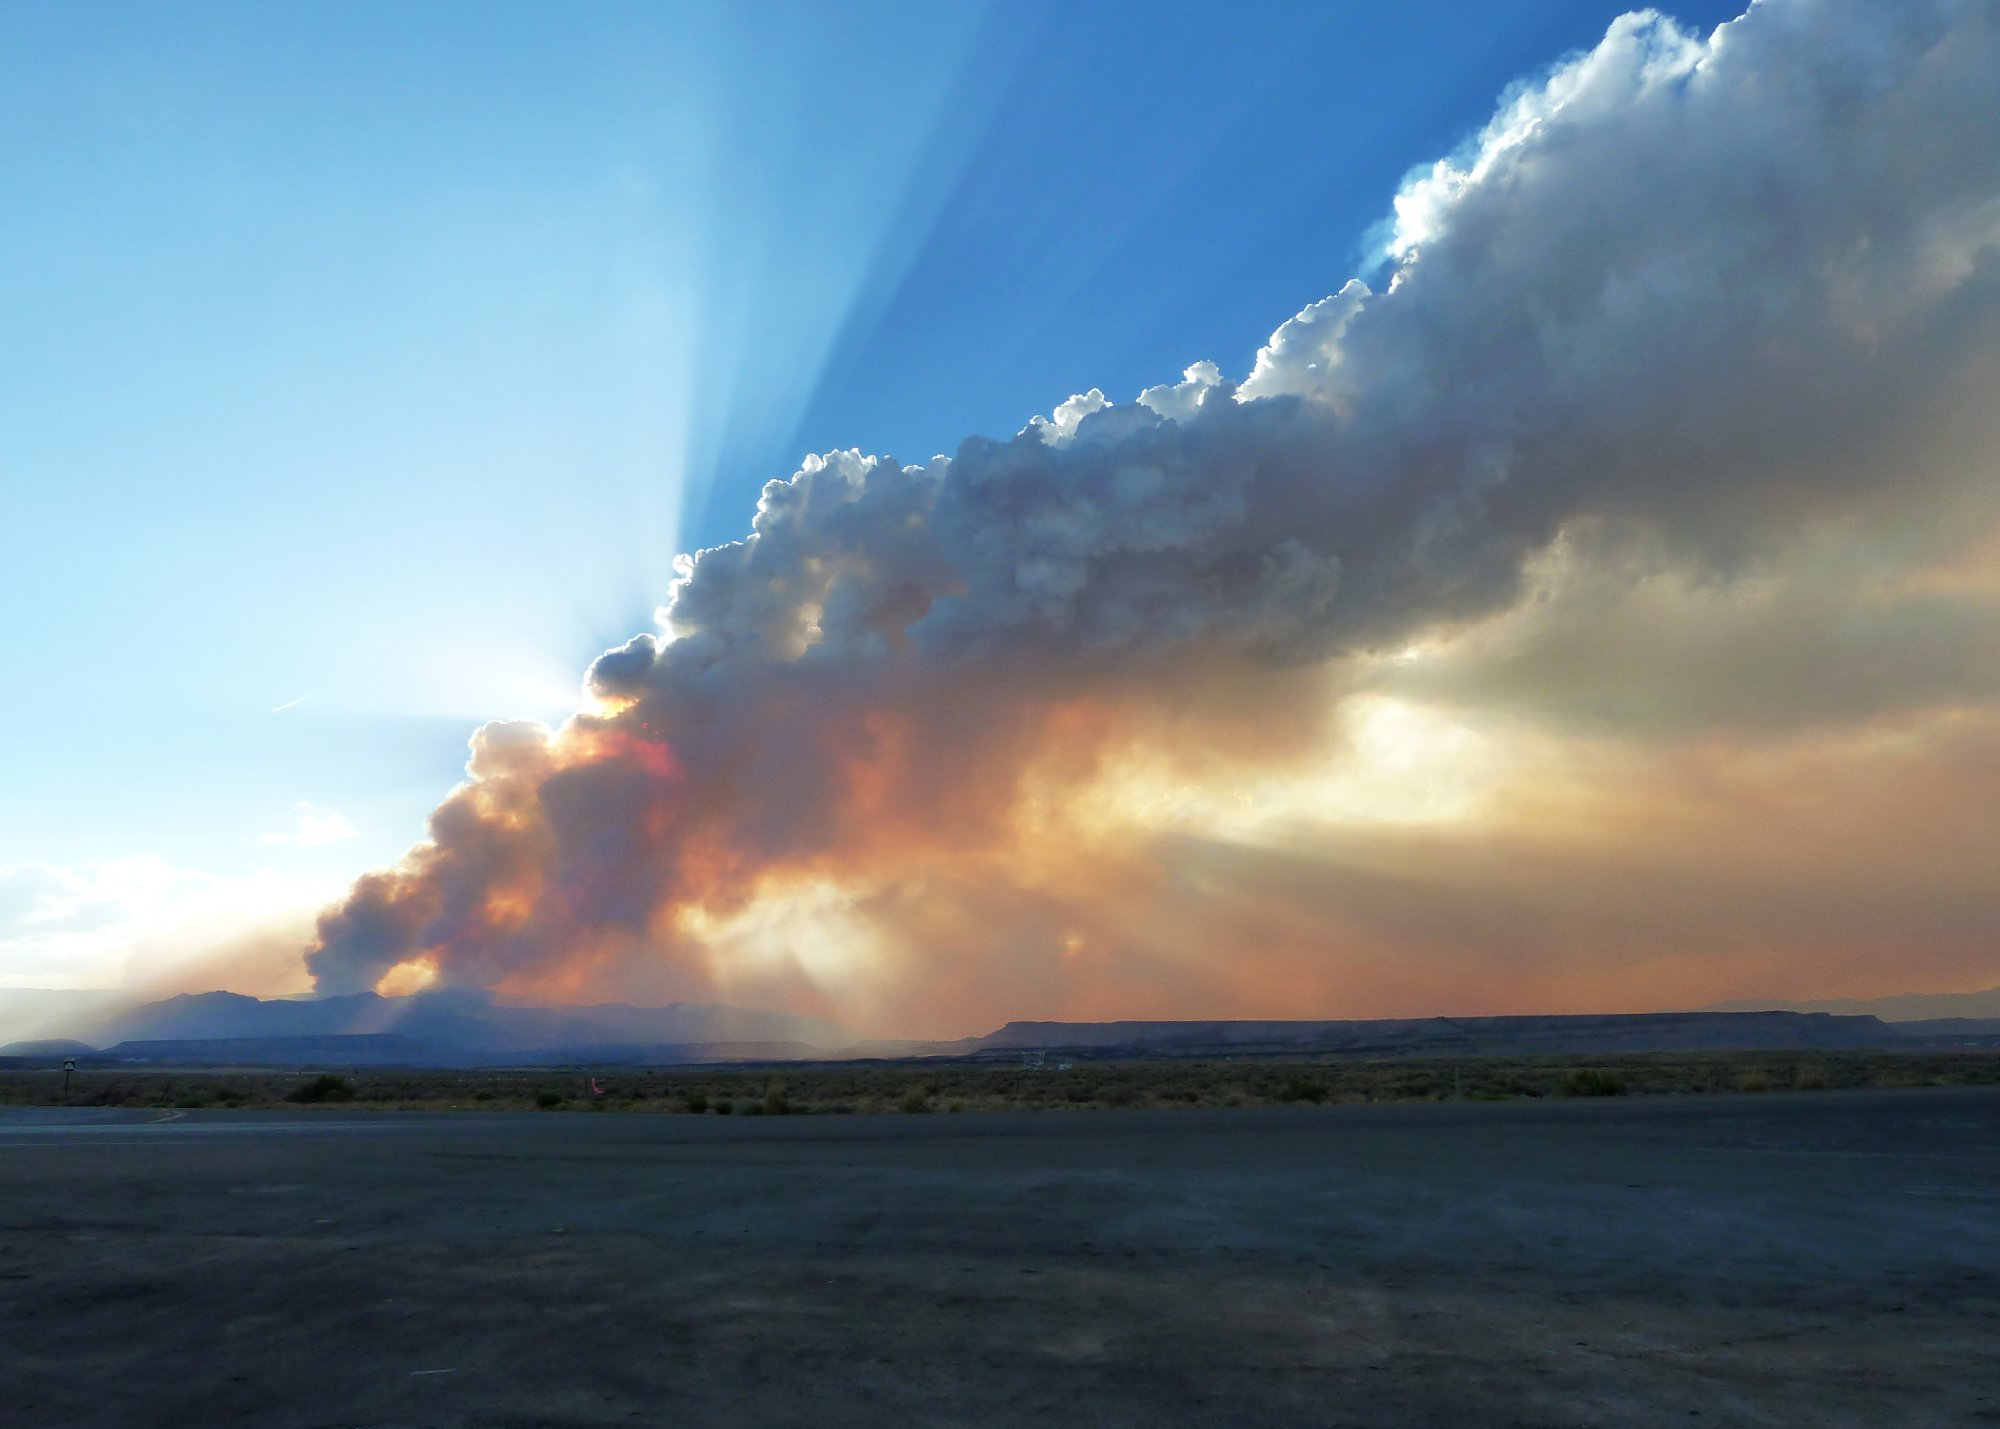 Seeley fire near Emery County's Huntington Canyon 2012